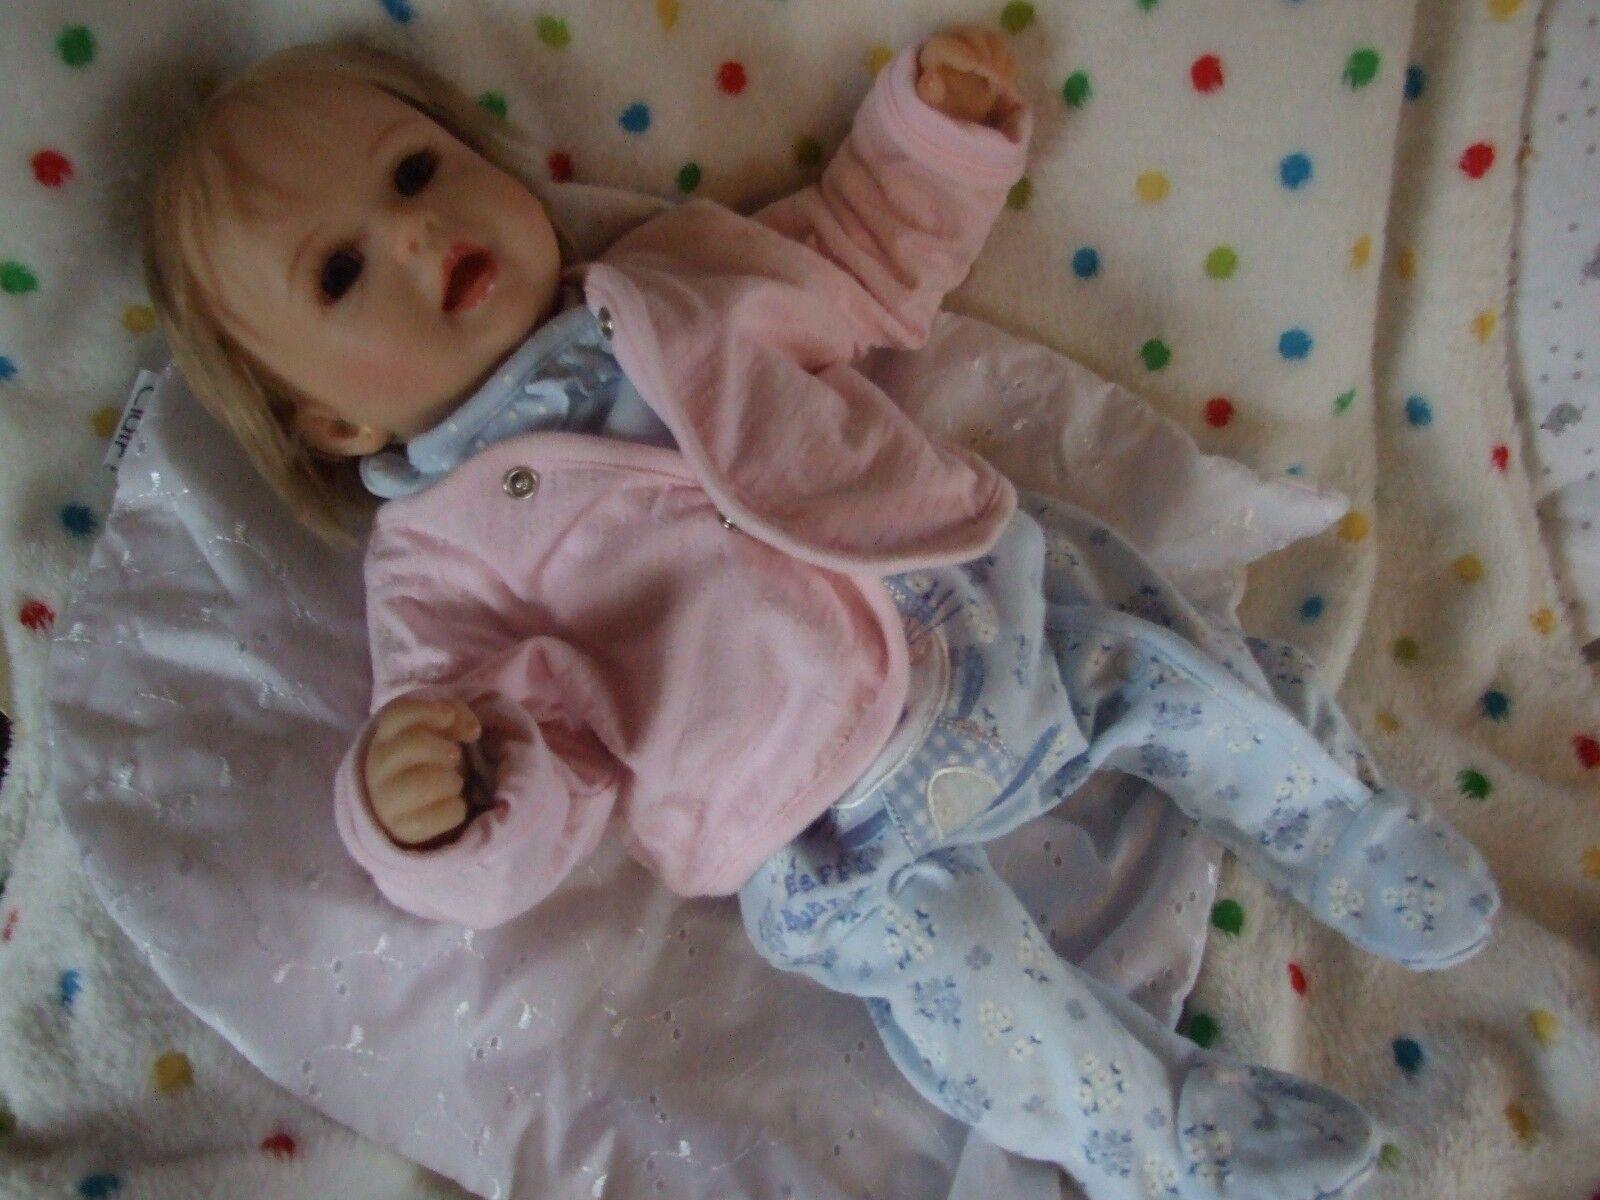 Realistic  Soft Soft Soft Bodied Baby Doll  Reborn realistic lifelike 6b2442